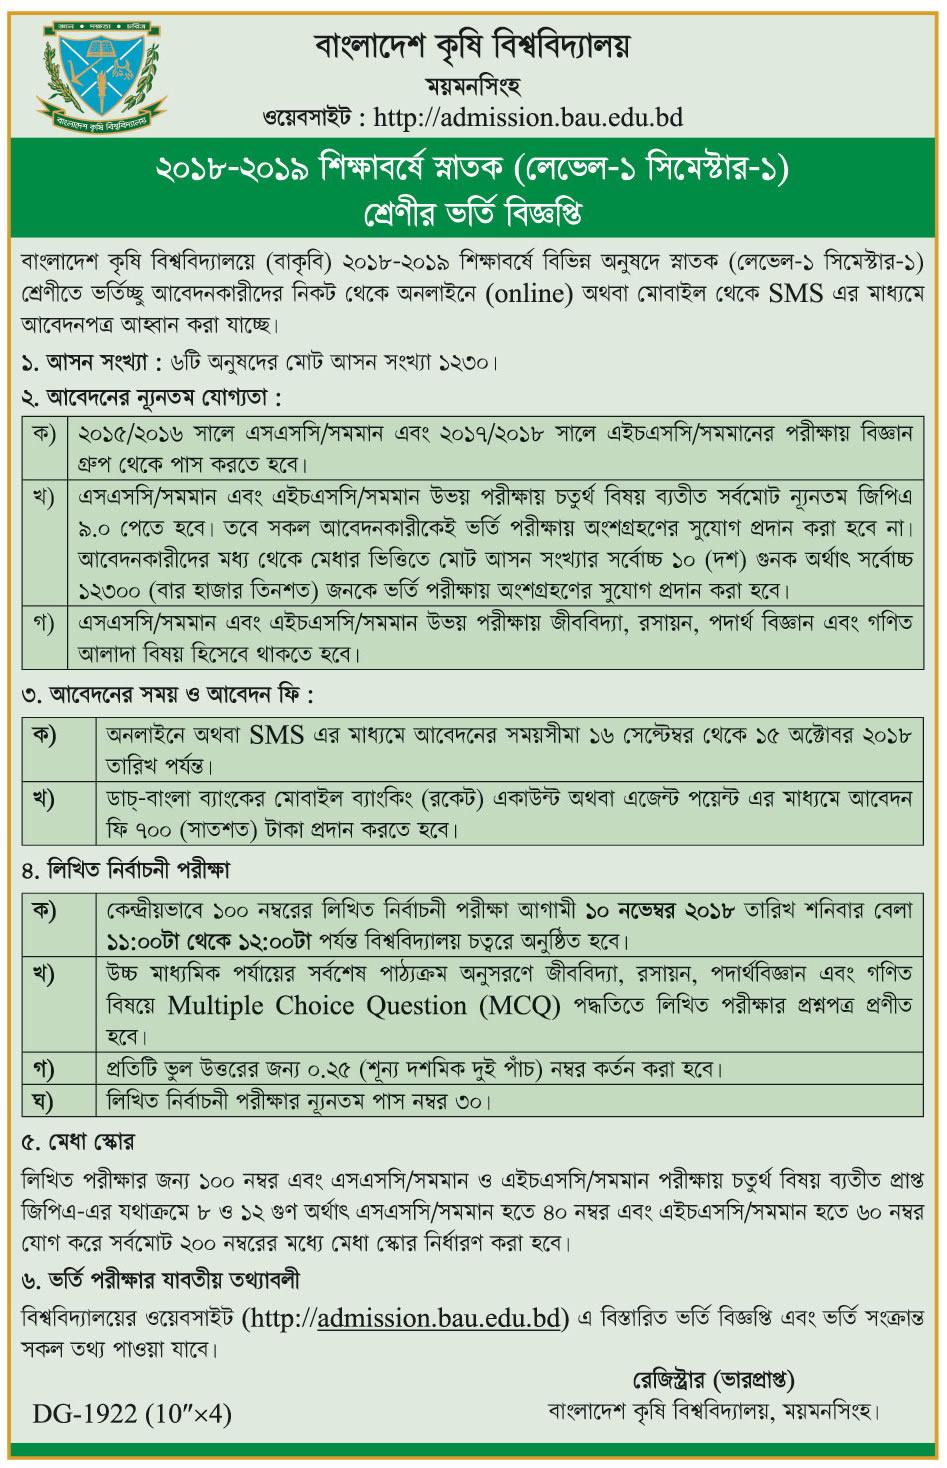 Bangladesh Agricultural University Admission Circular 2018-2019